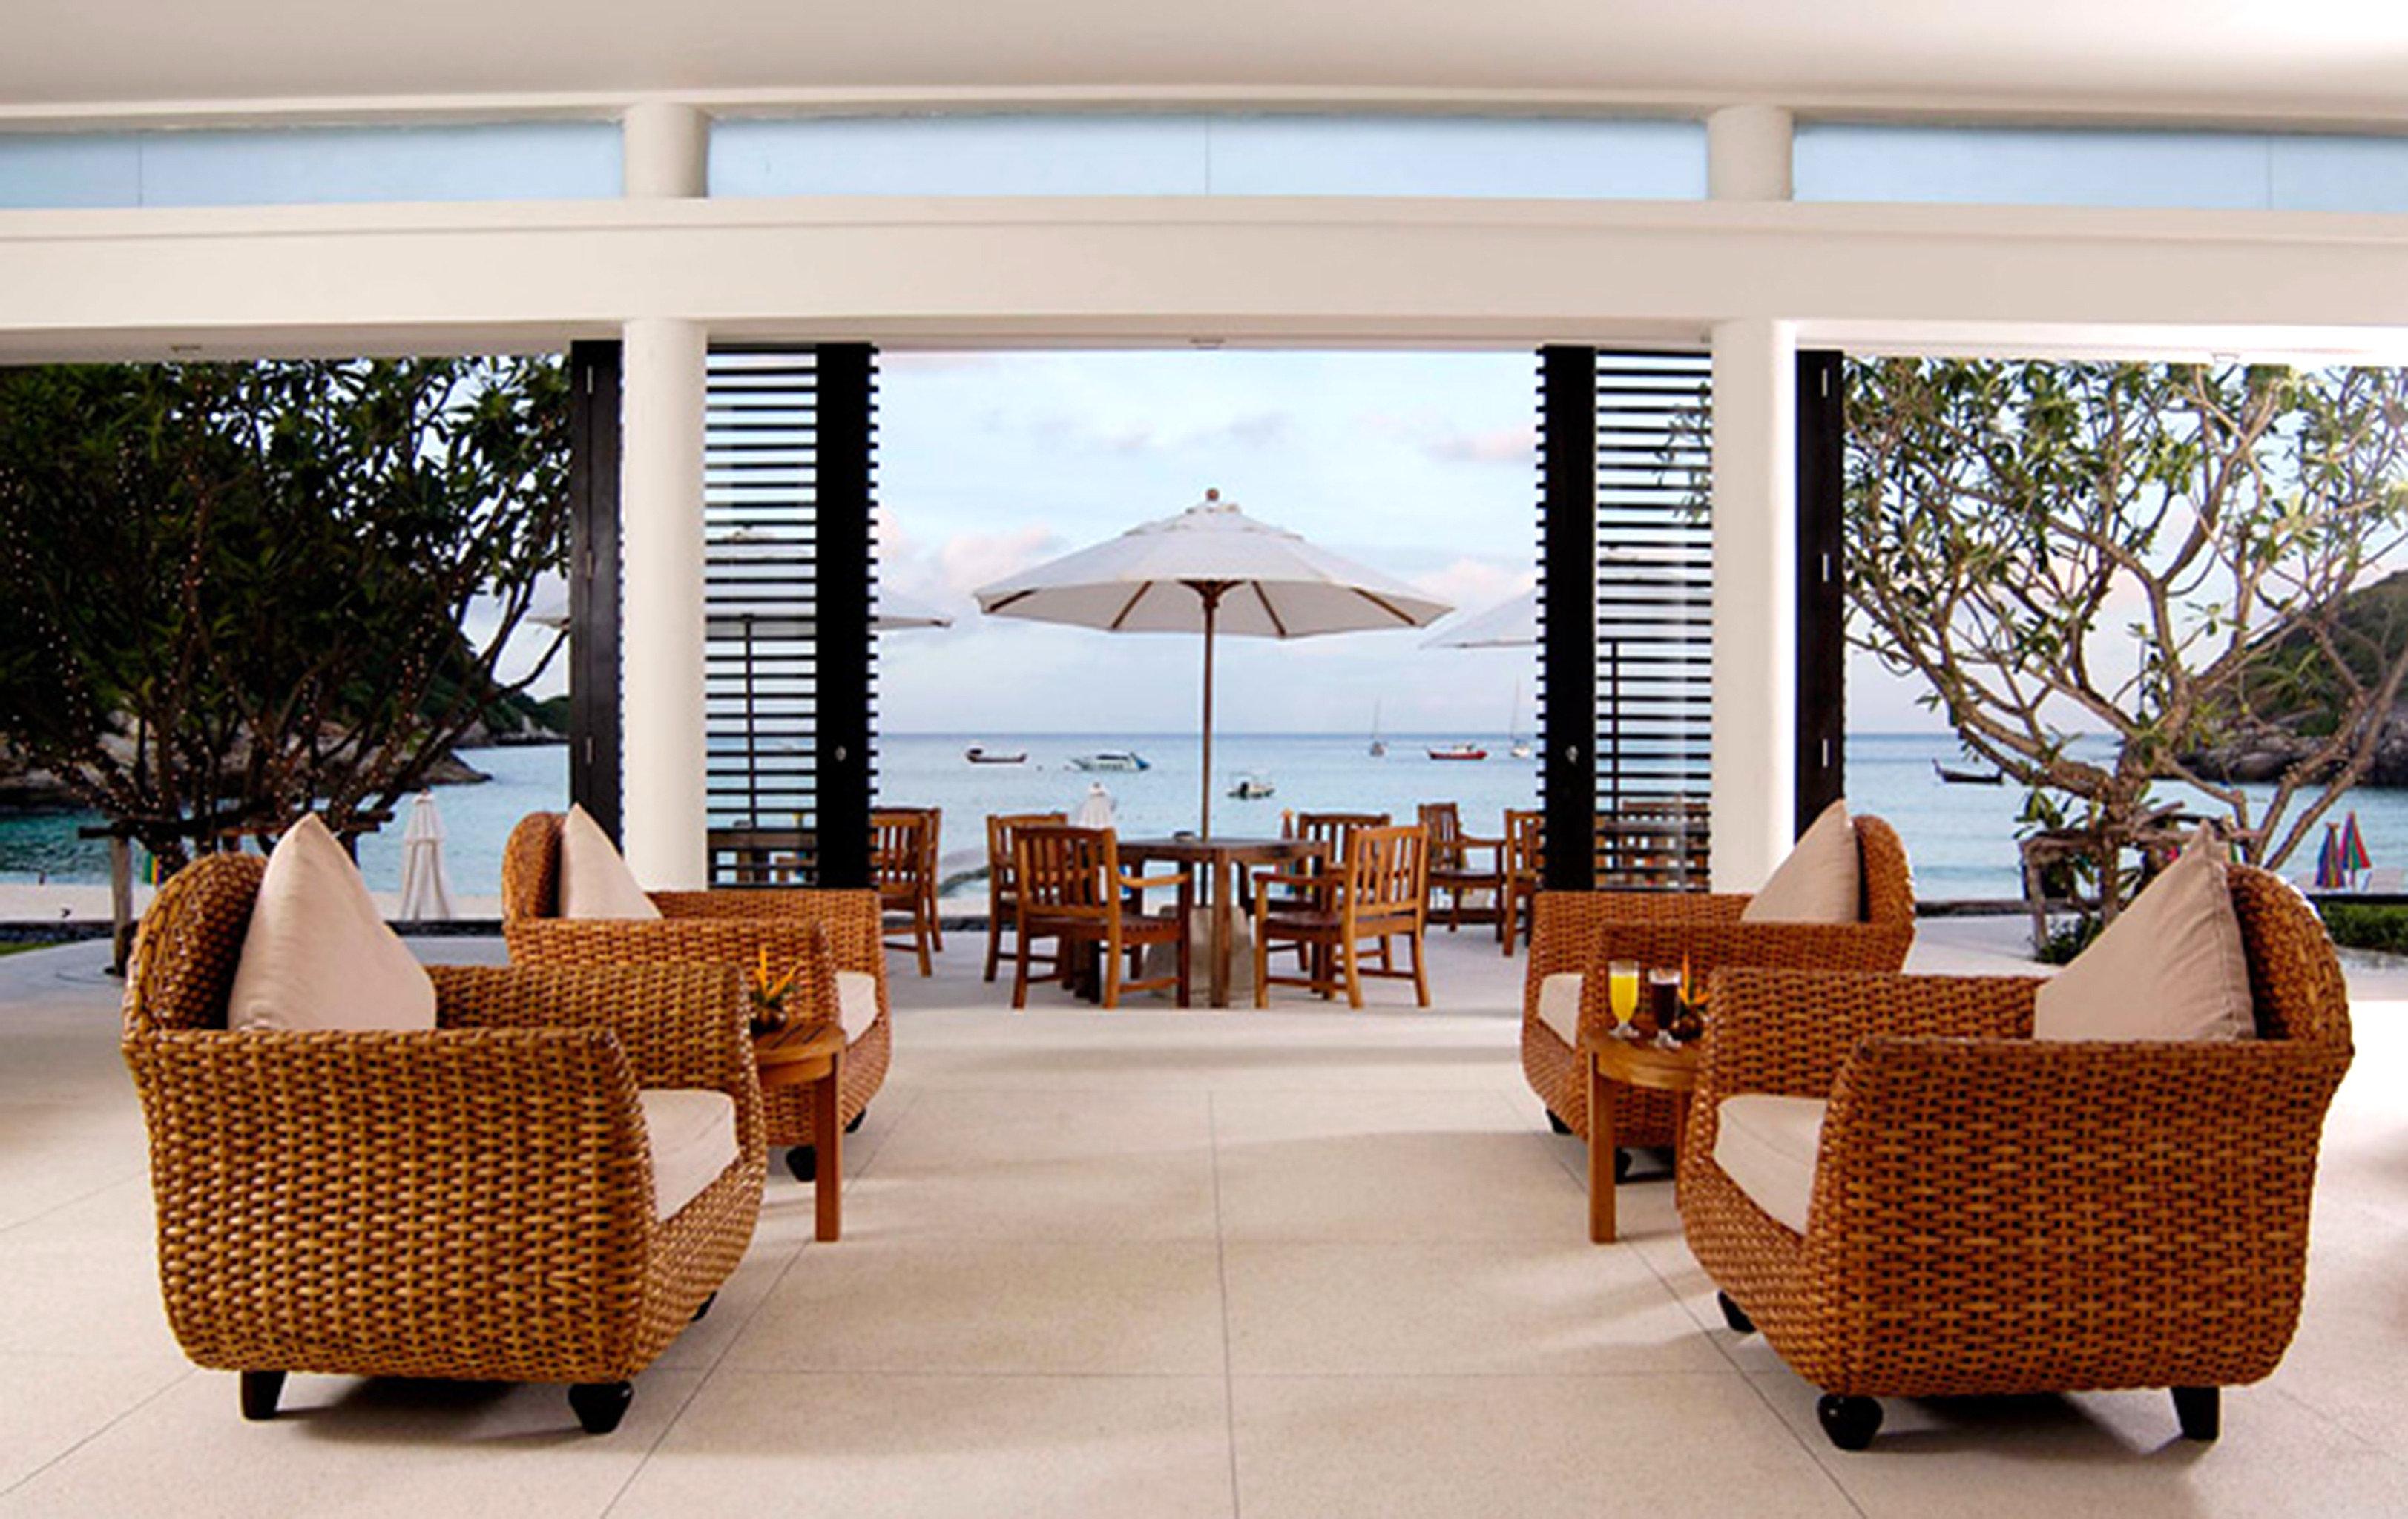 chair property Resort home living room porch outdoor structure Villa wicker condominium restaurant